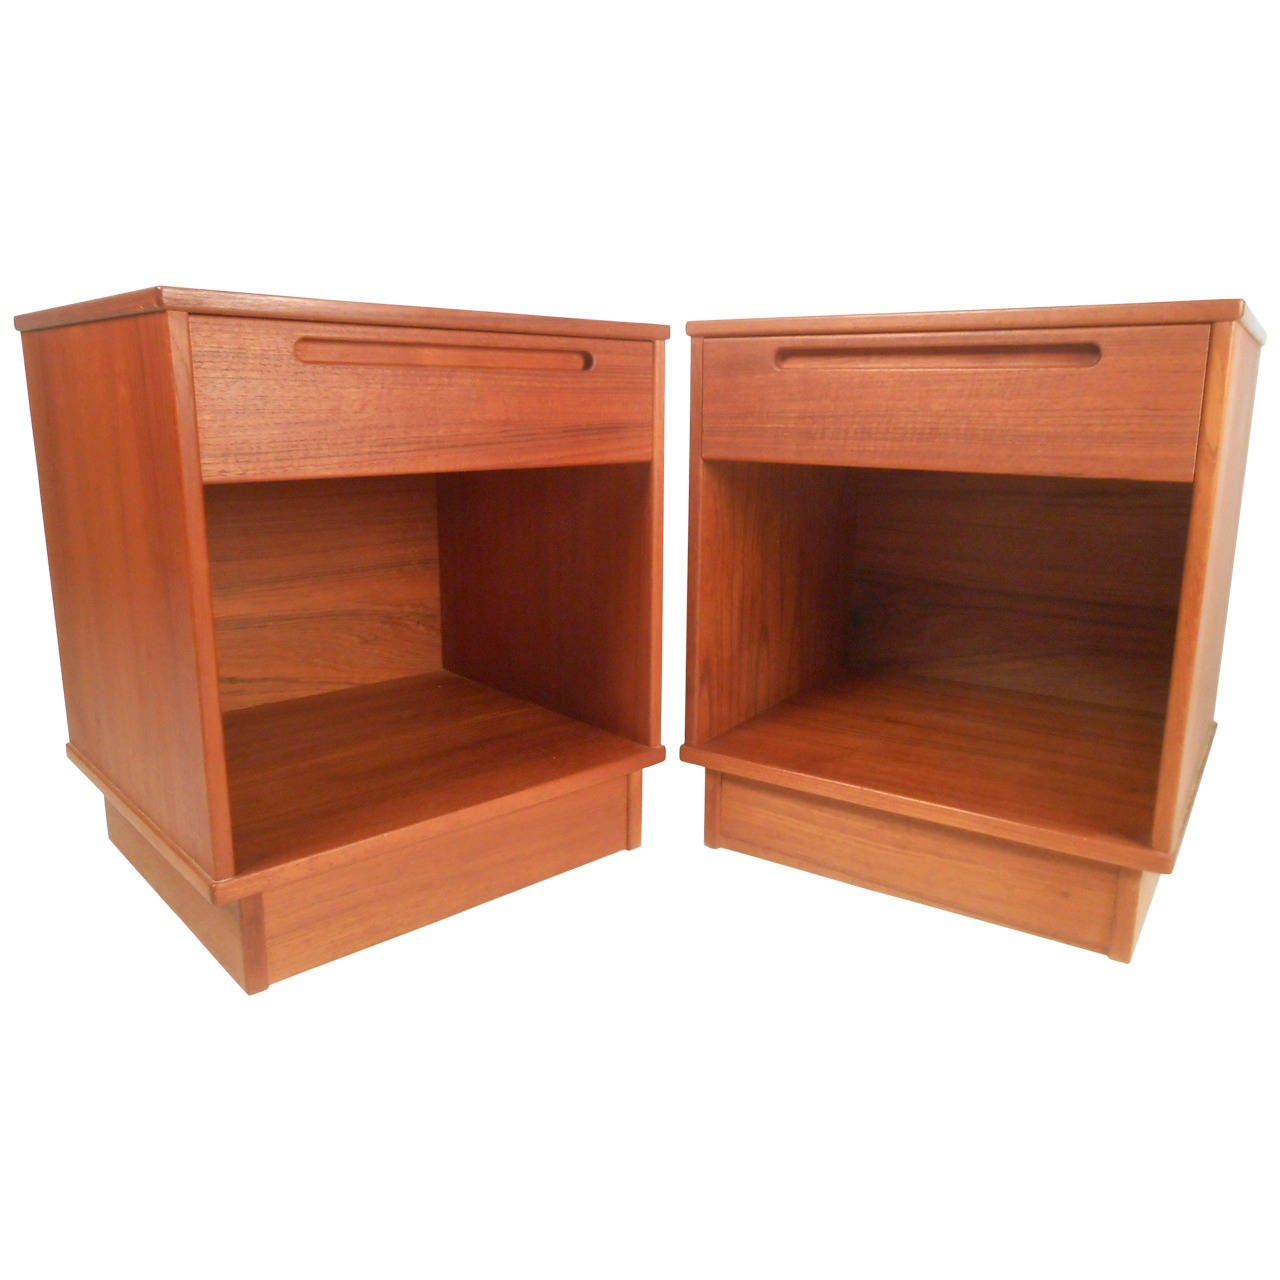 Midcentury style danish teak single drawer nightstands for sale at 1stdibs for Danish teak bedroom furniture